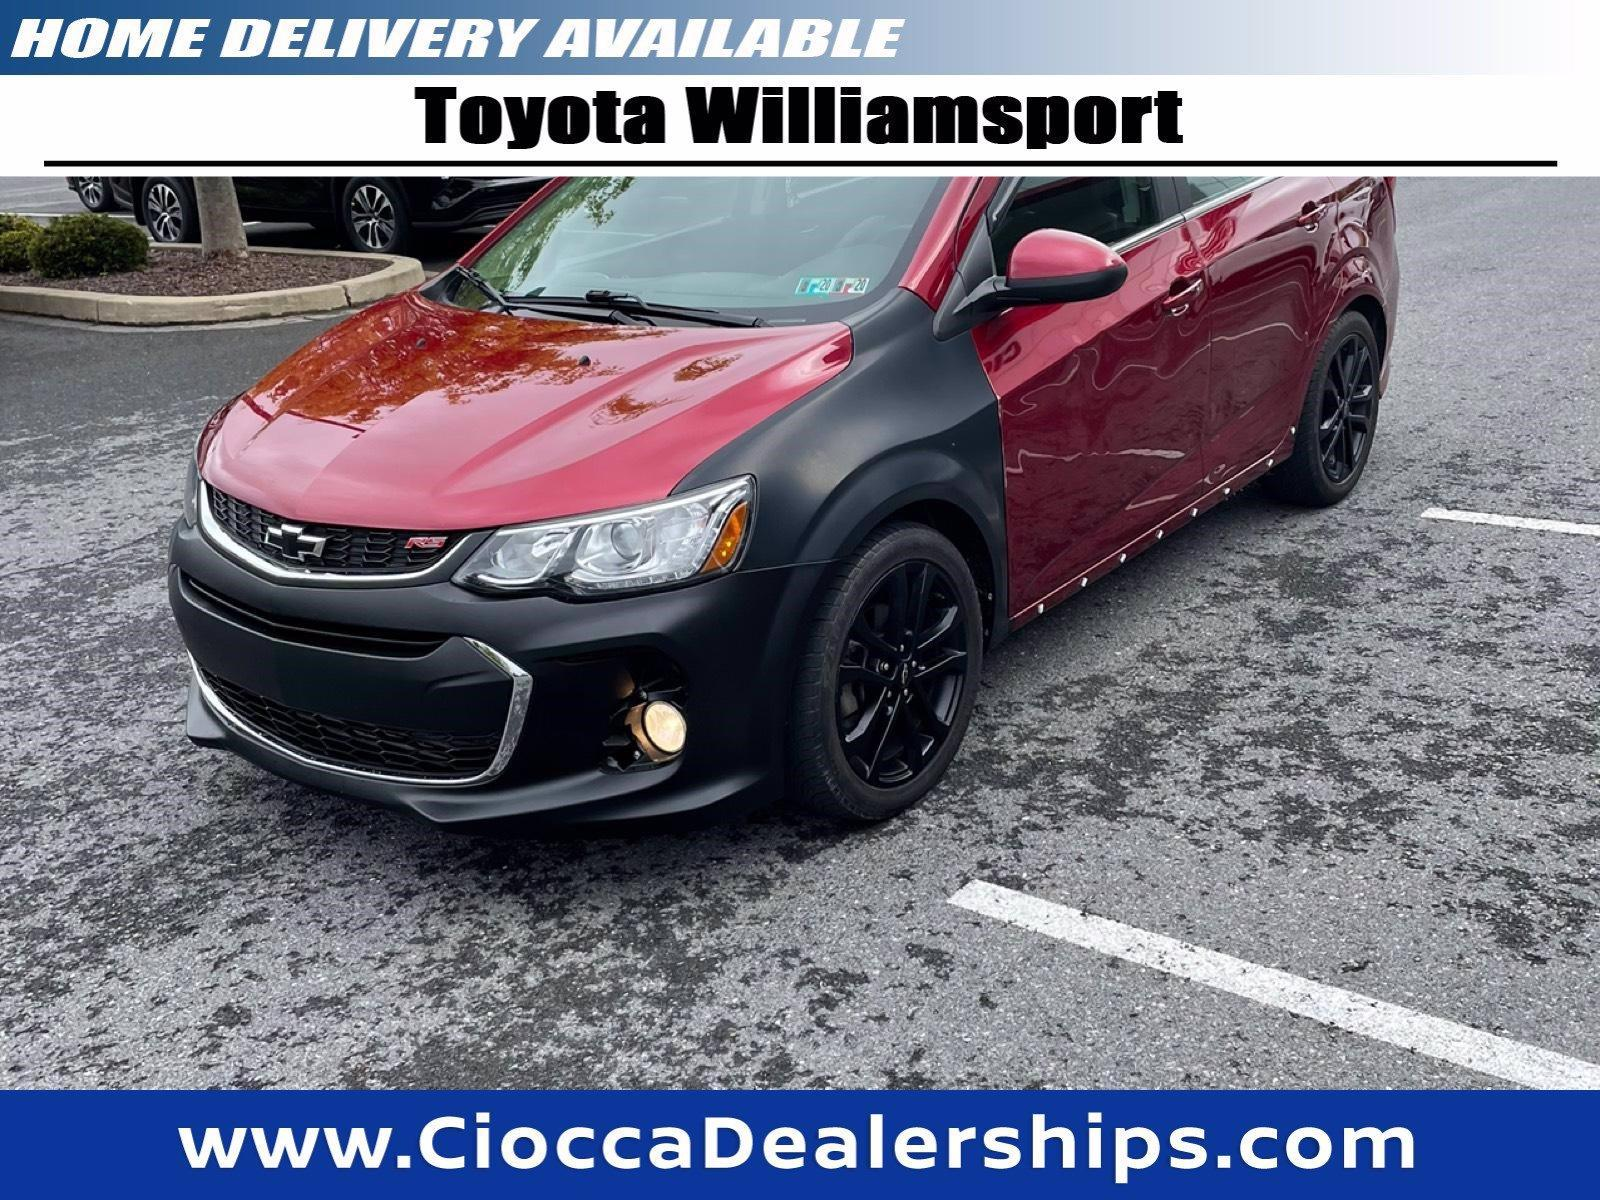 2018 Chevrolet Sonic Vehicle Photo in Muncy, PA 17756